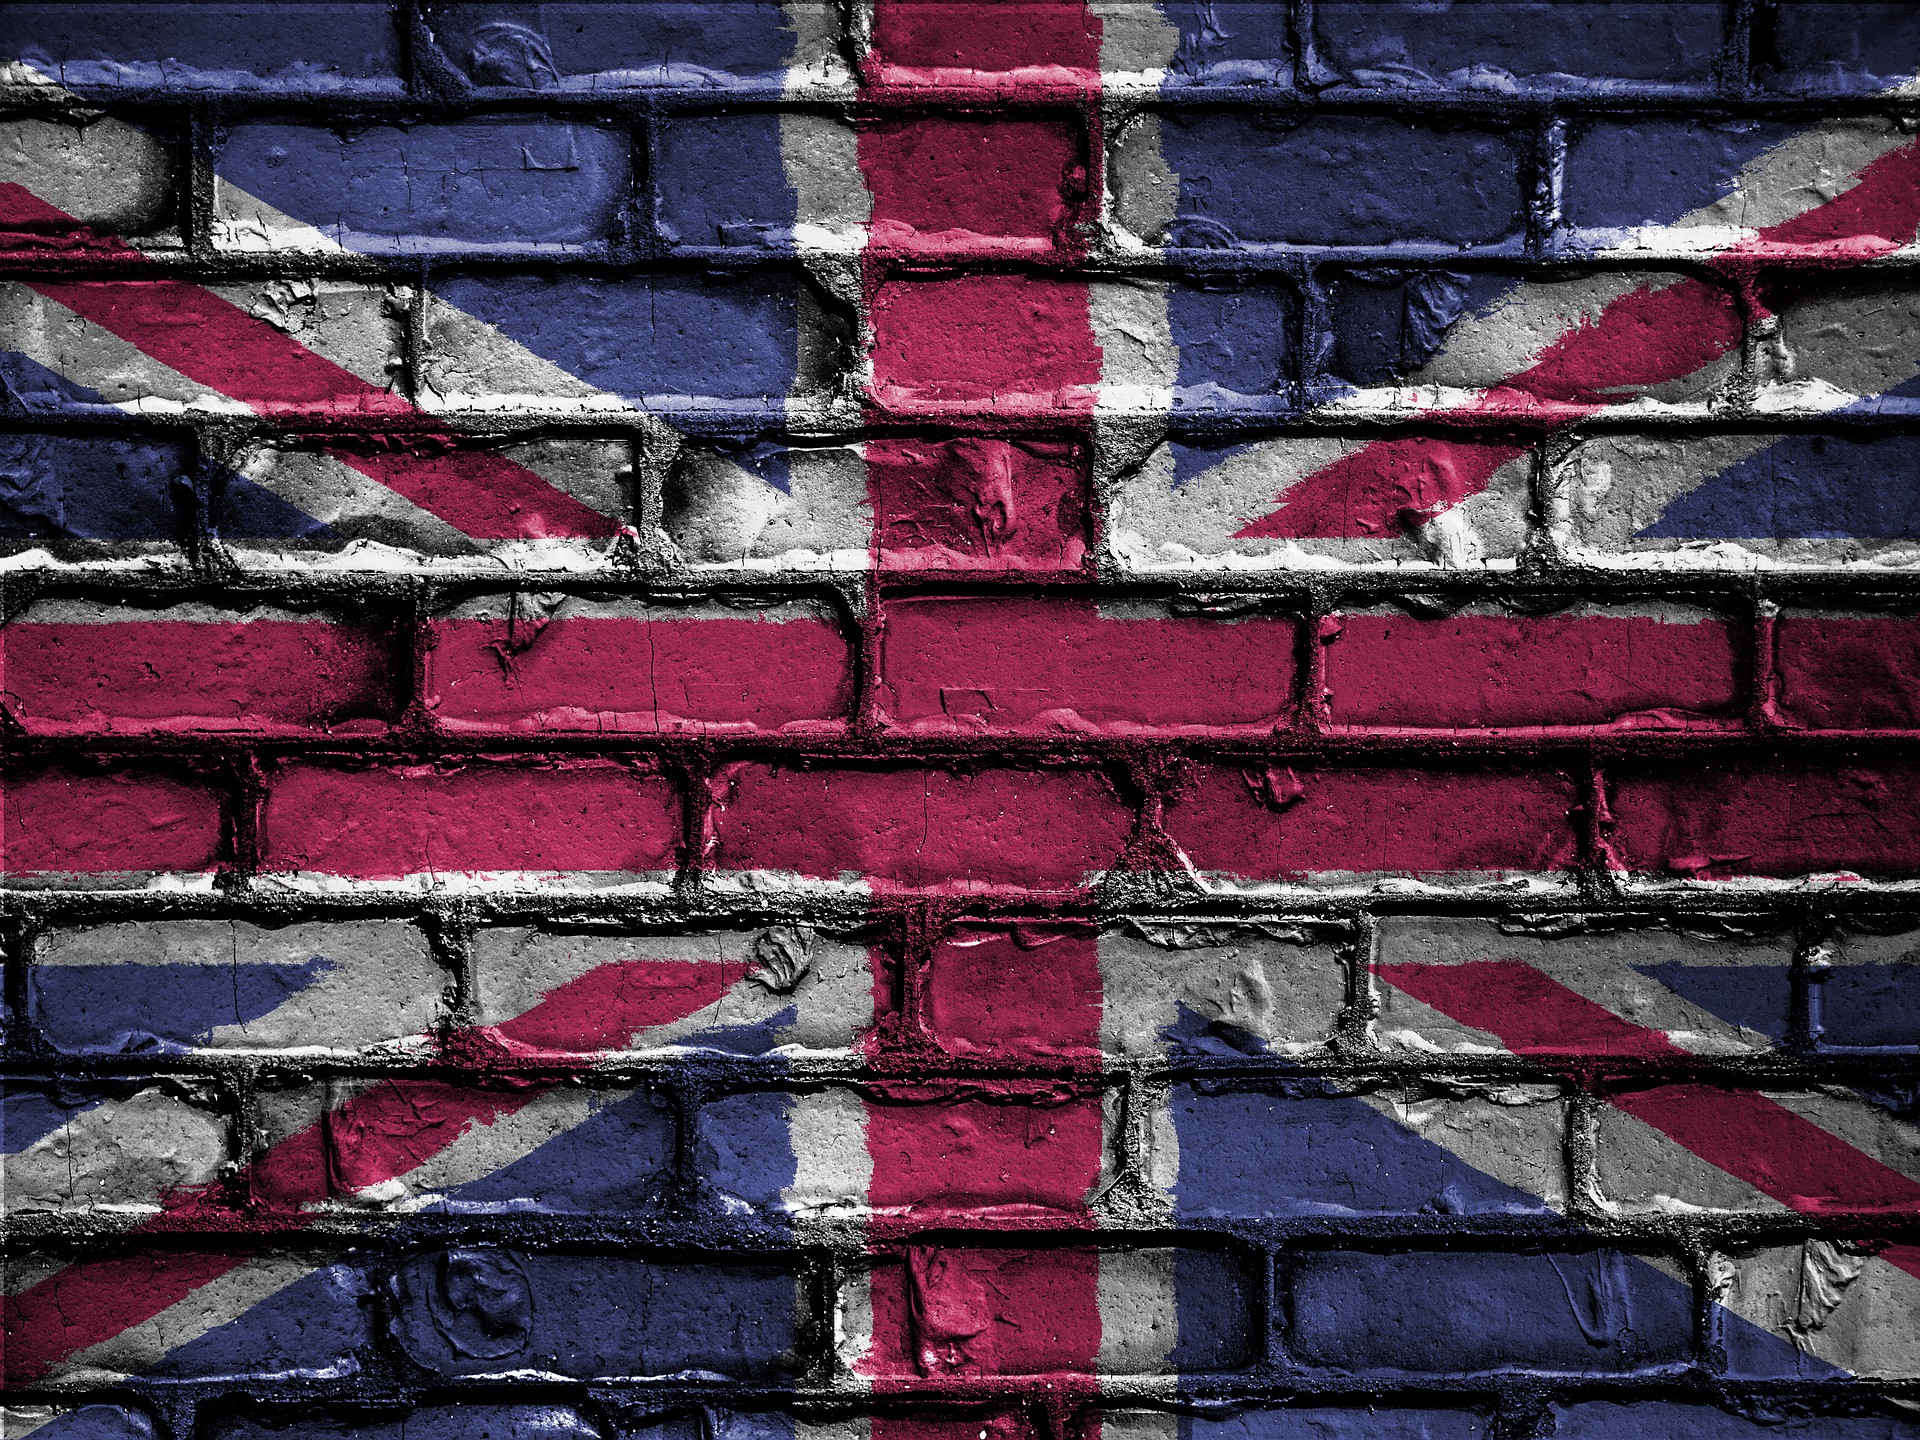 Britse vlag, Groot-Brittannië, VK